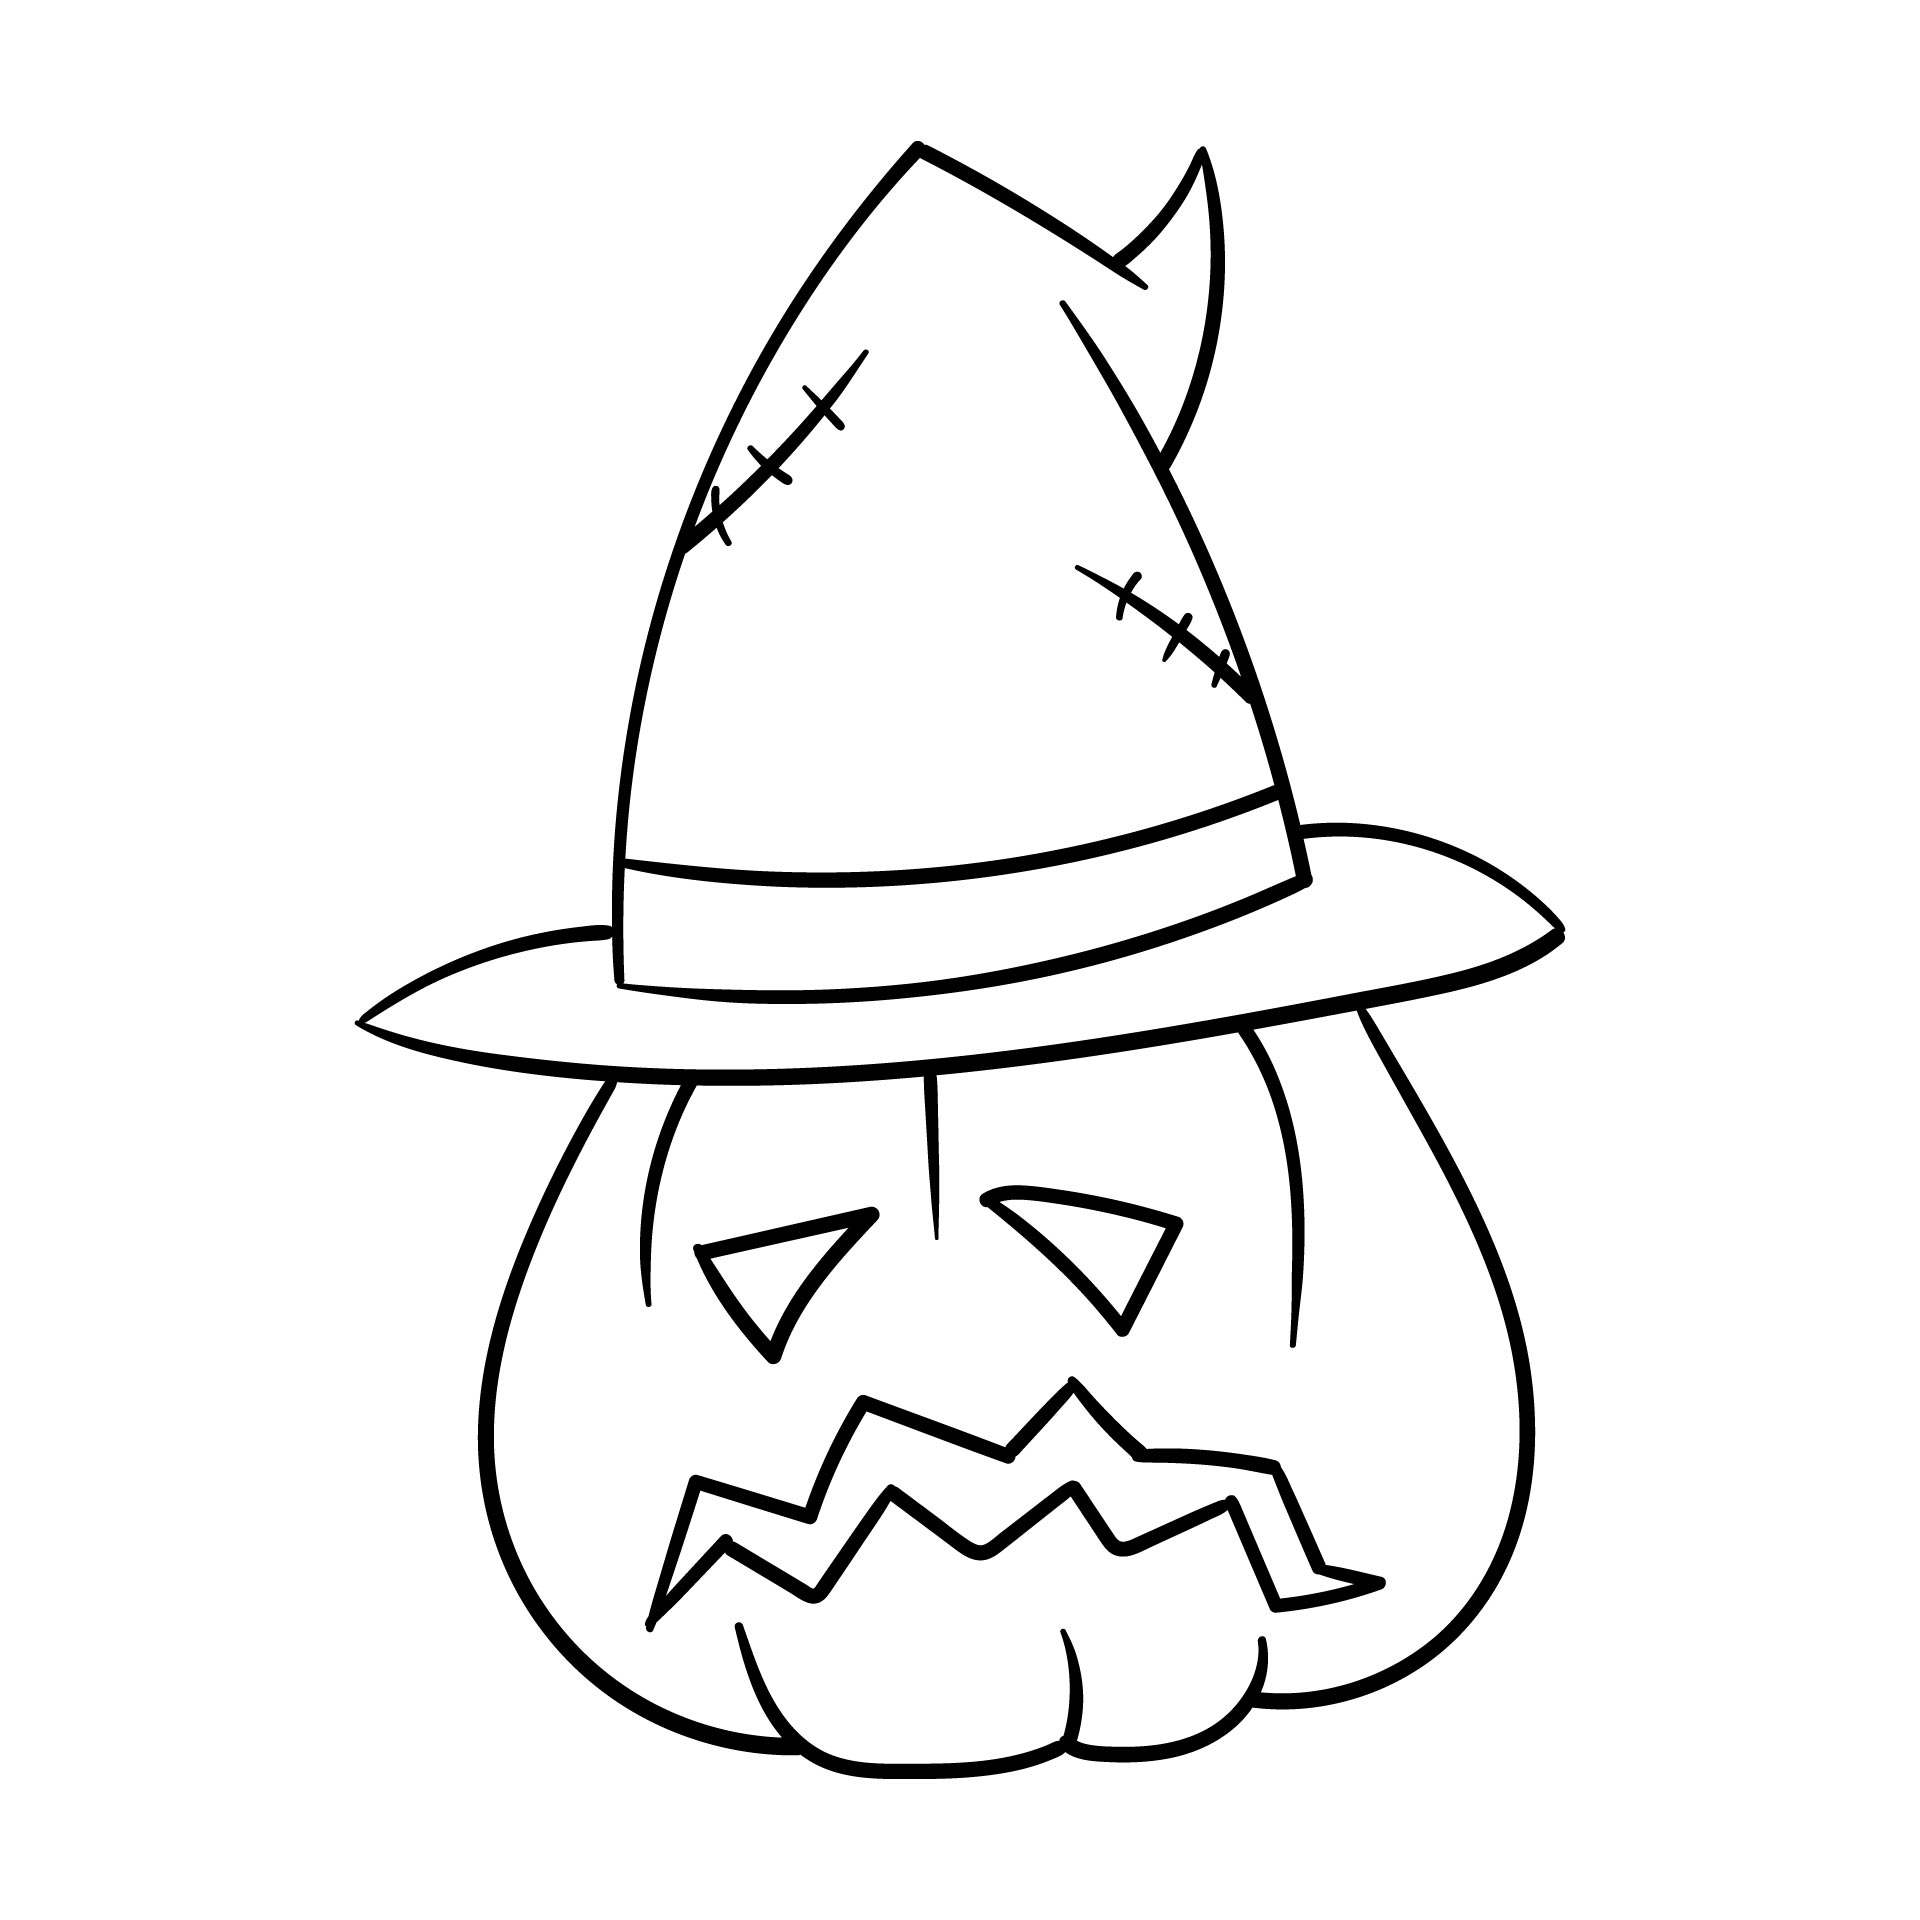 Jack O Lantern Pumpkins Halloween Free Printable Coloring Pages